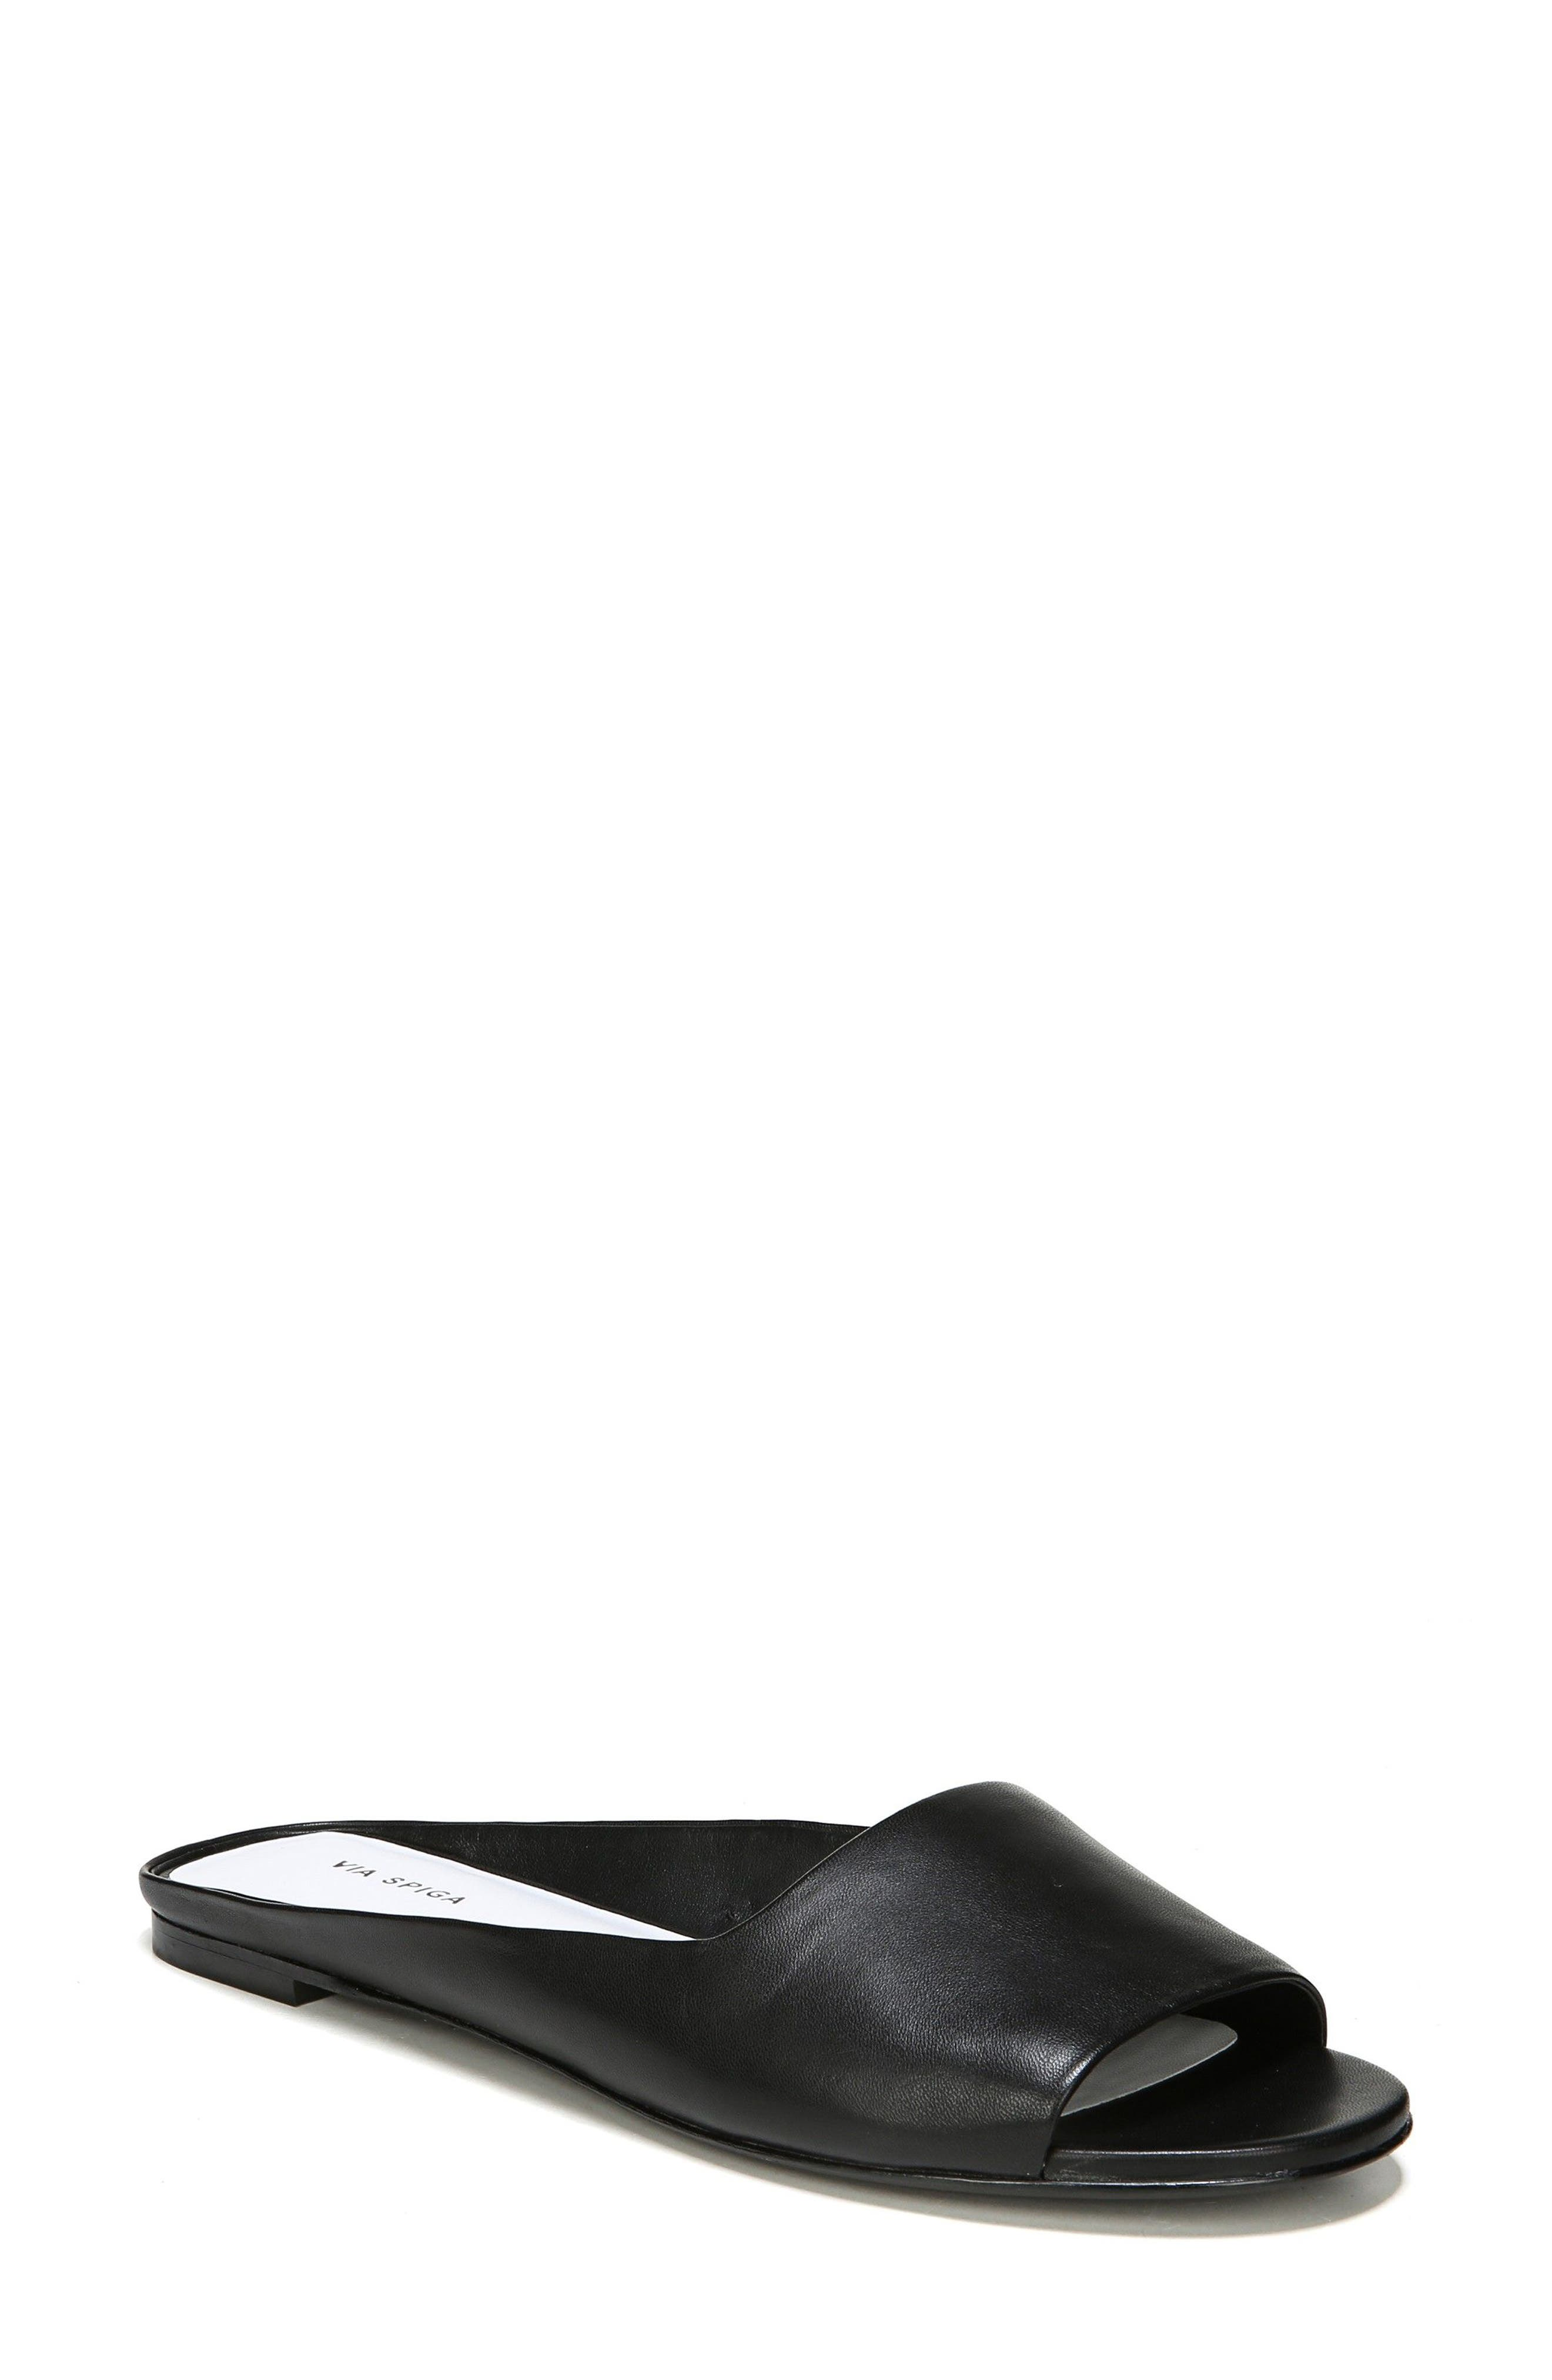 Hana Slide Sandal,                         Main,                         color,